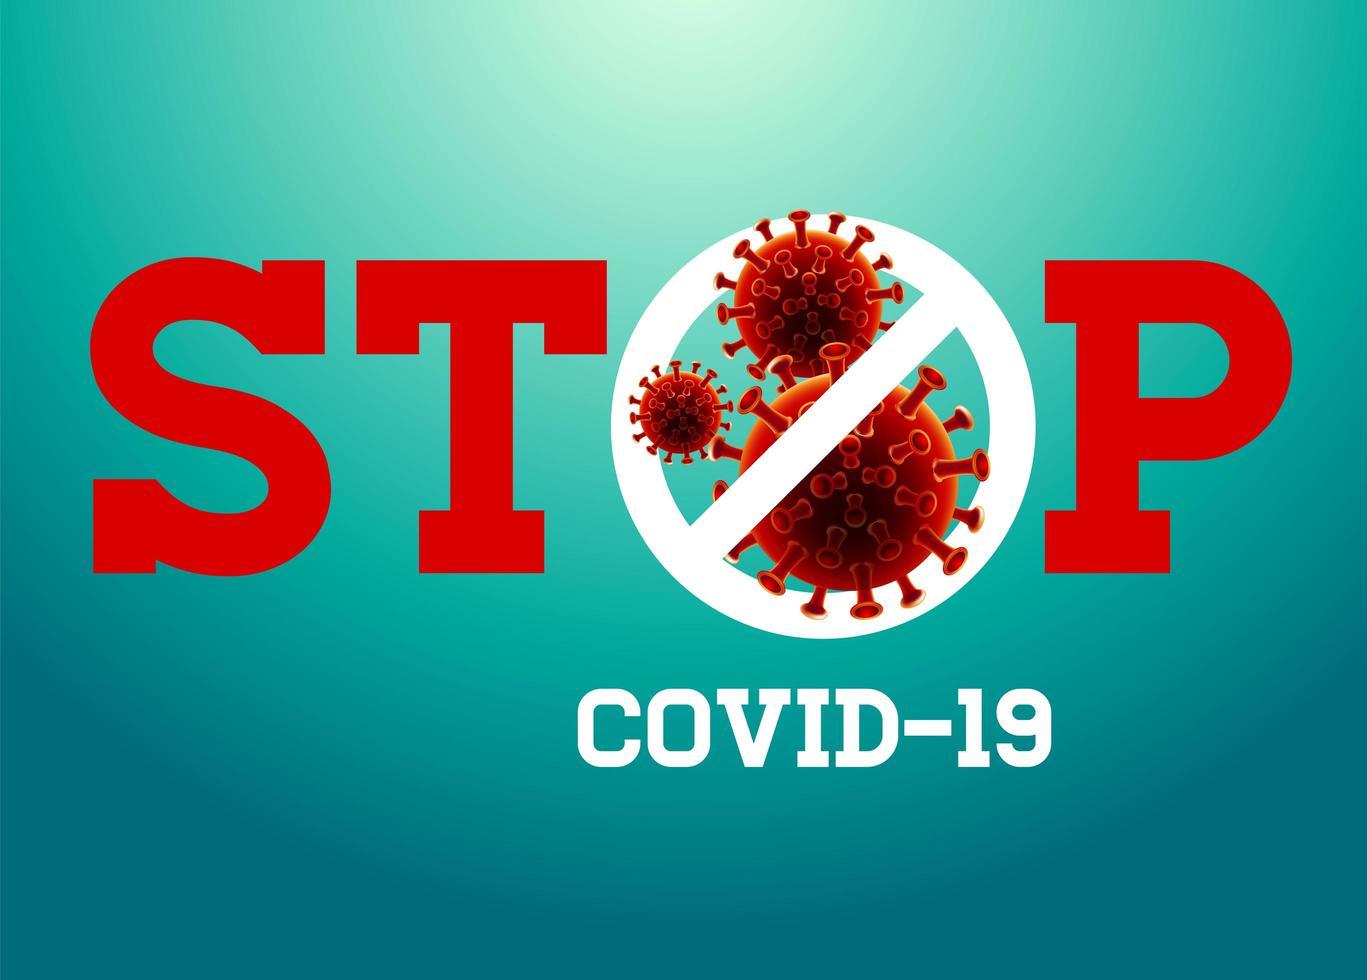 Stoppen Sie das Coronavirus-Covid-19-Design vektor